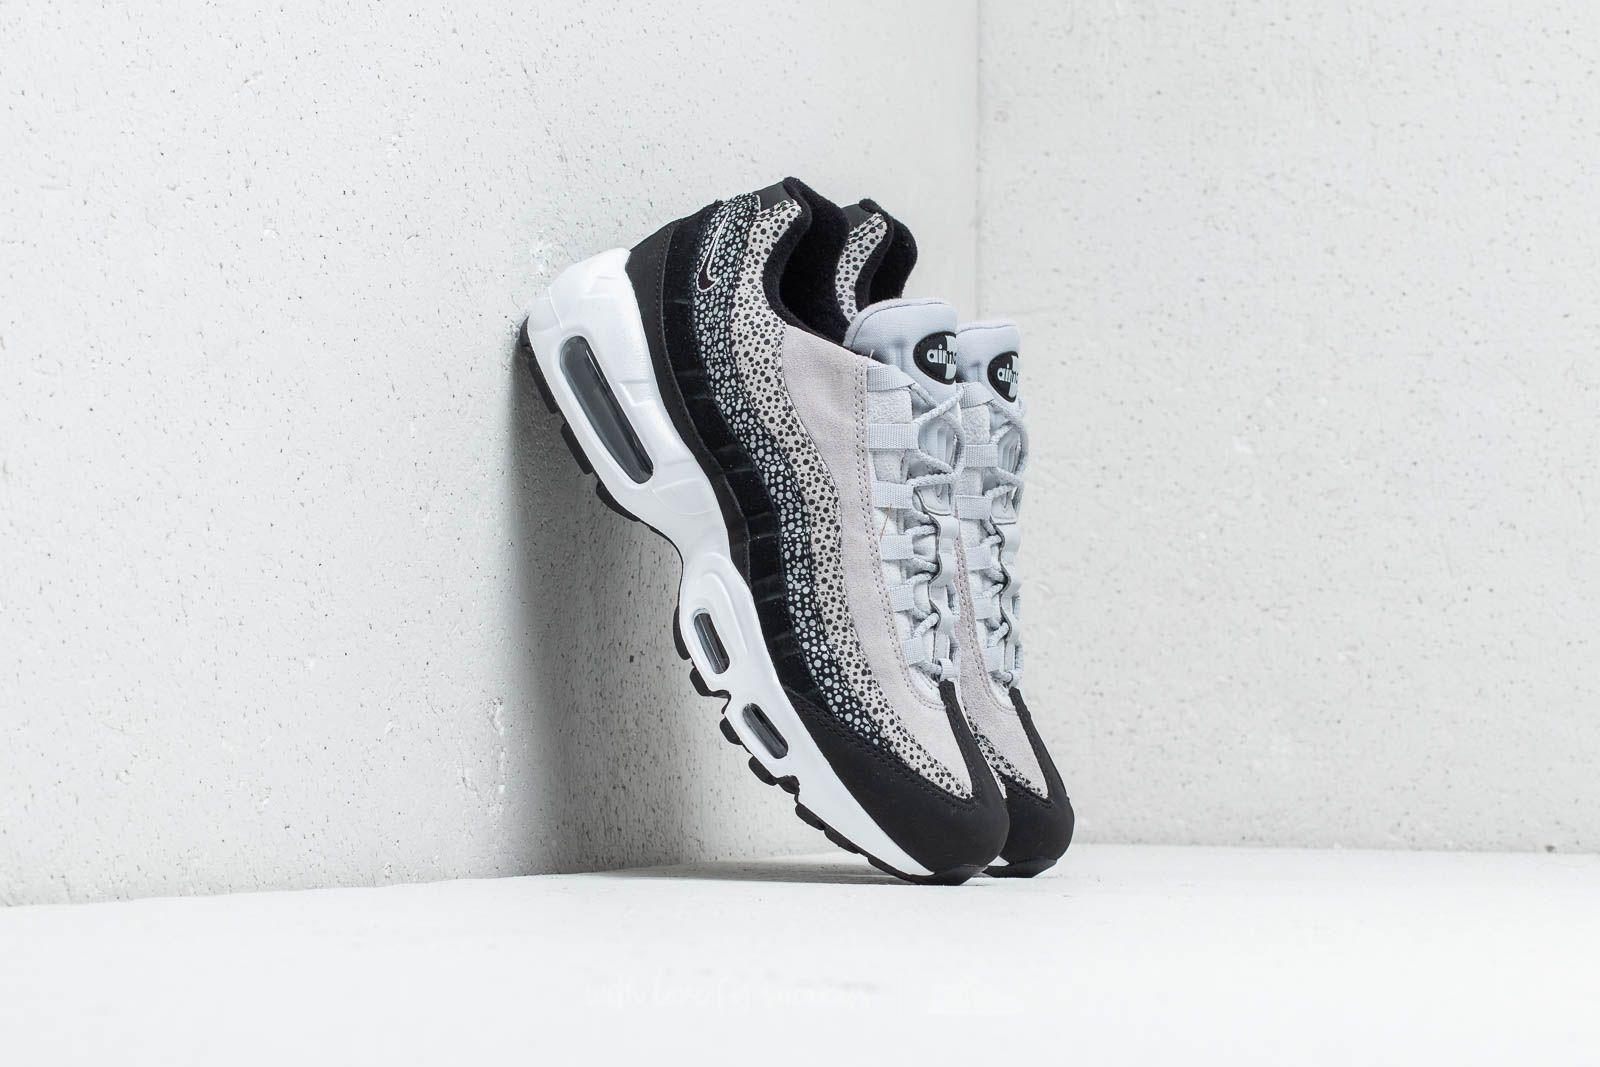 Nike Wmns Air Max 95 Premium Black/ Black-Wolf Grey-White za skvělou cenu 3 210 Kč koupíte na Footshop.cz